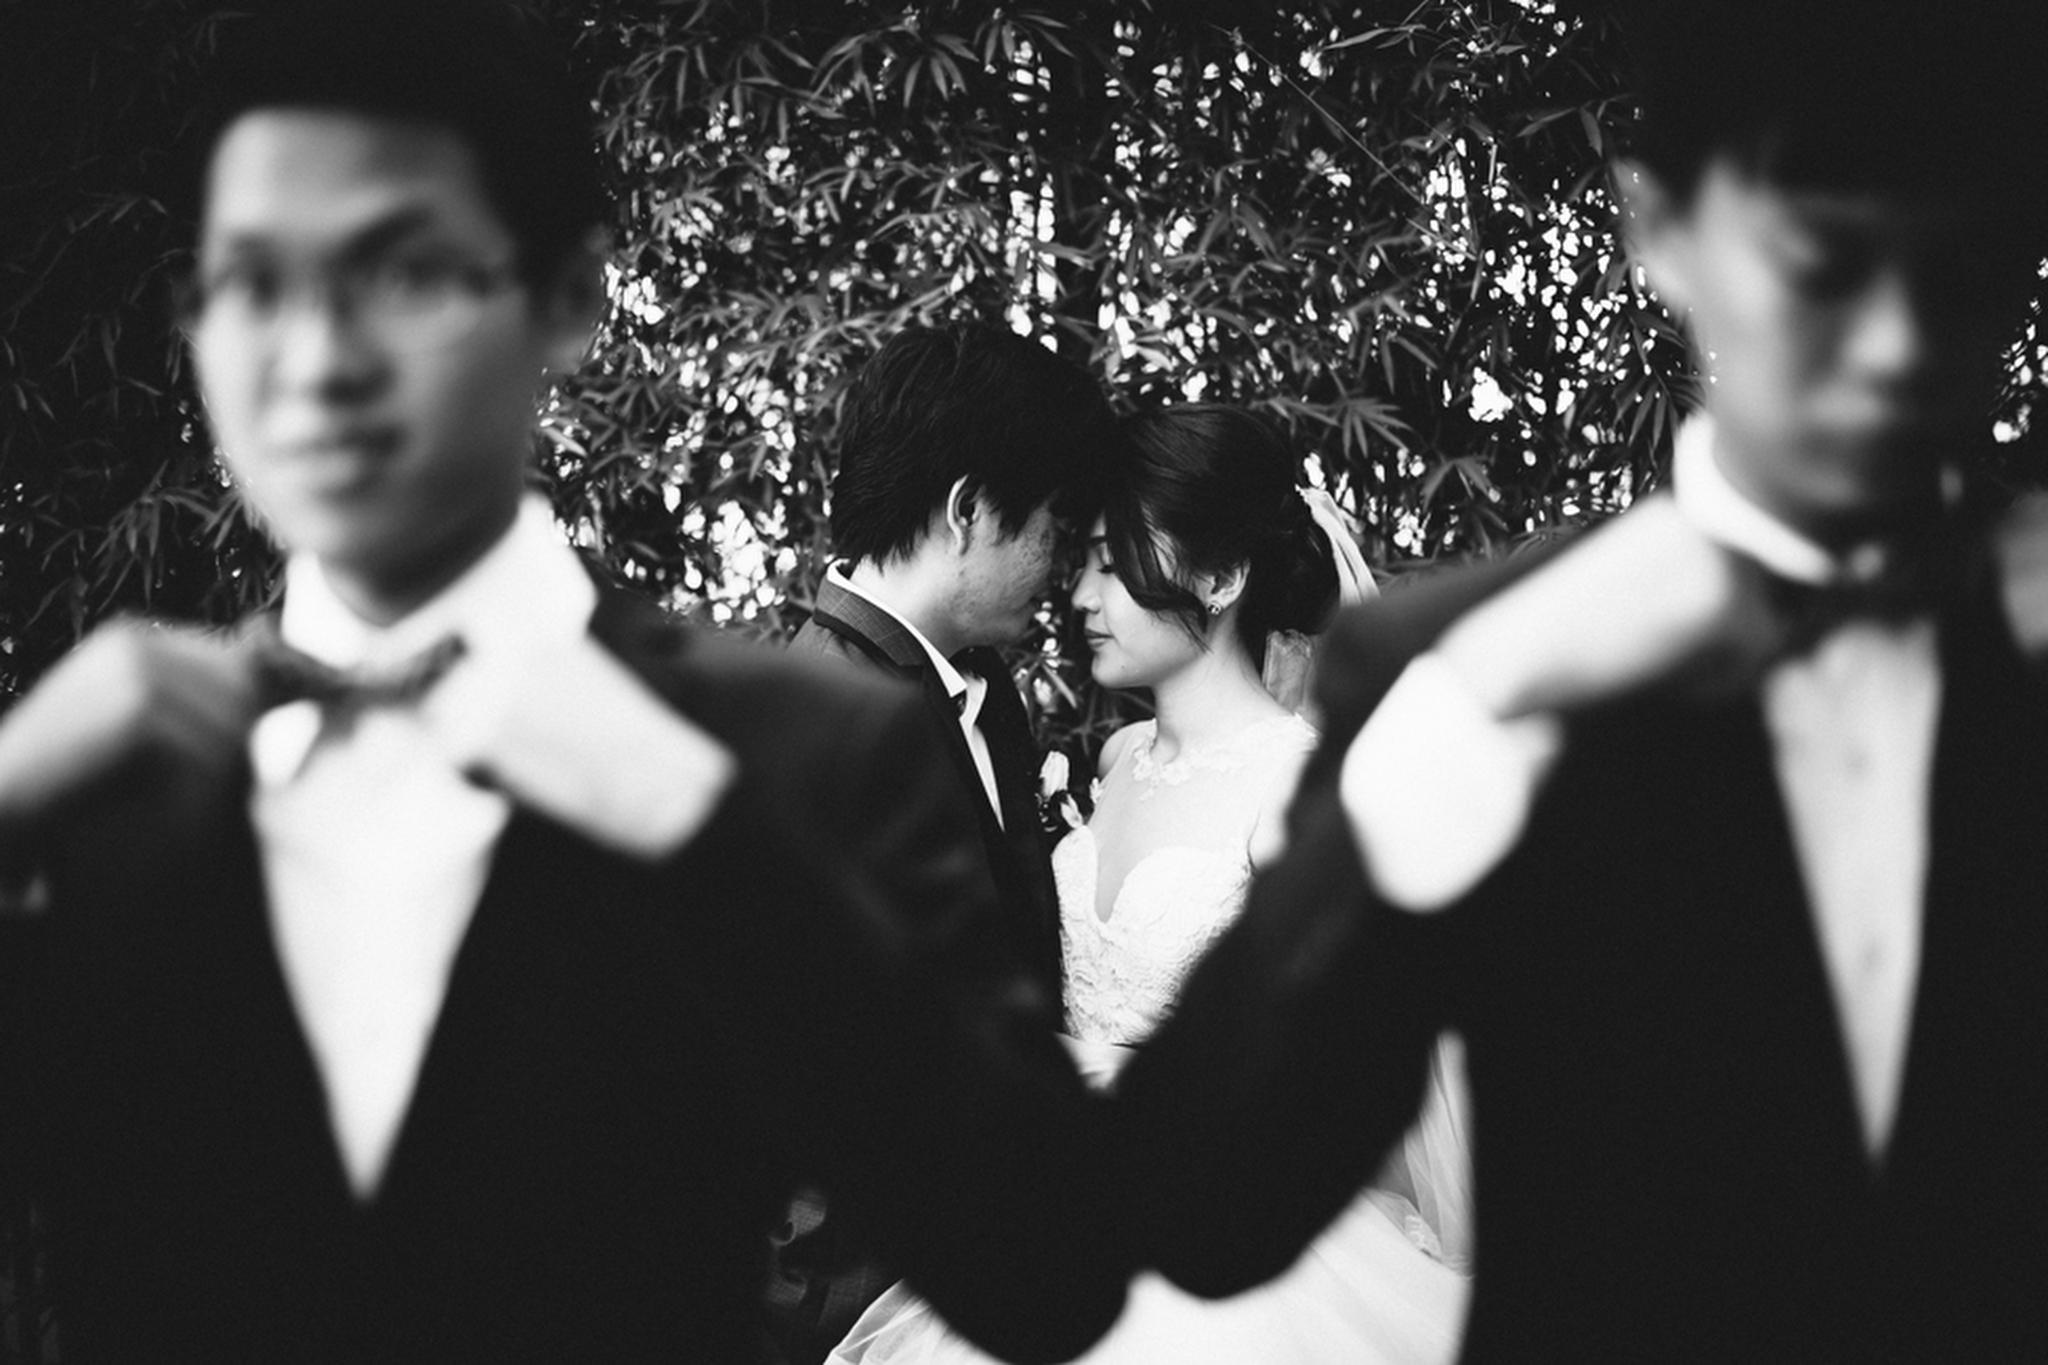 Singapore Wedding Photographer - Joey & Amily Wedding Day (85 of 154).JPG